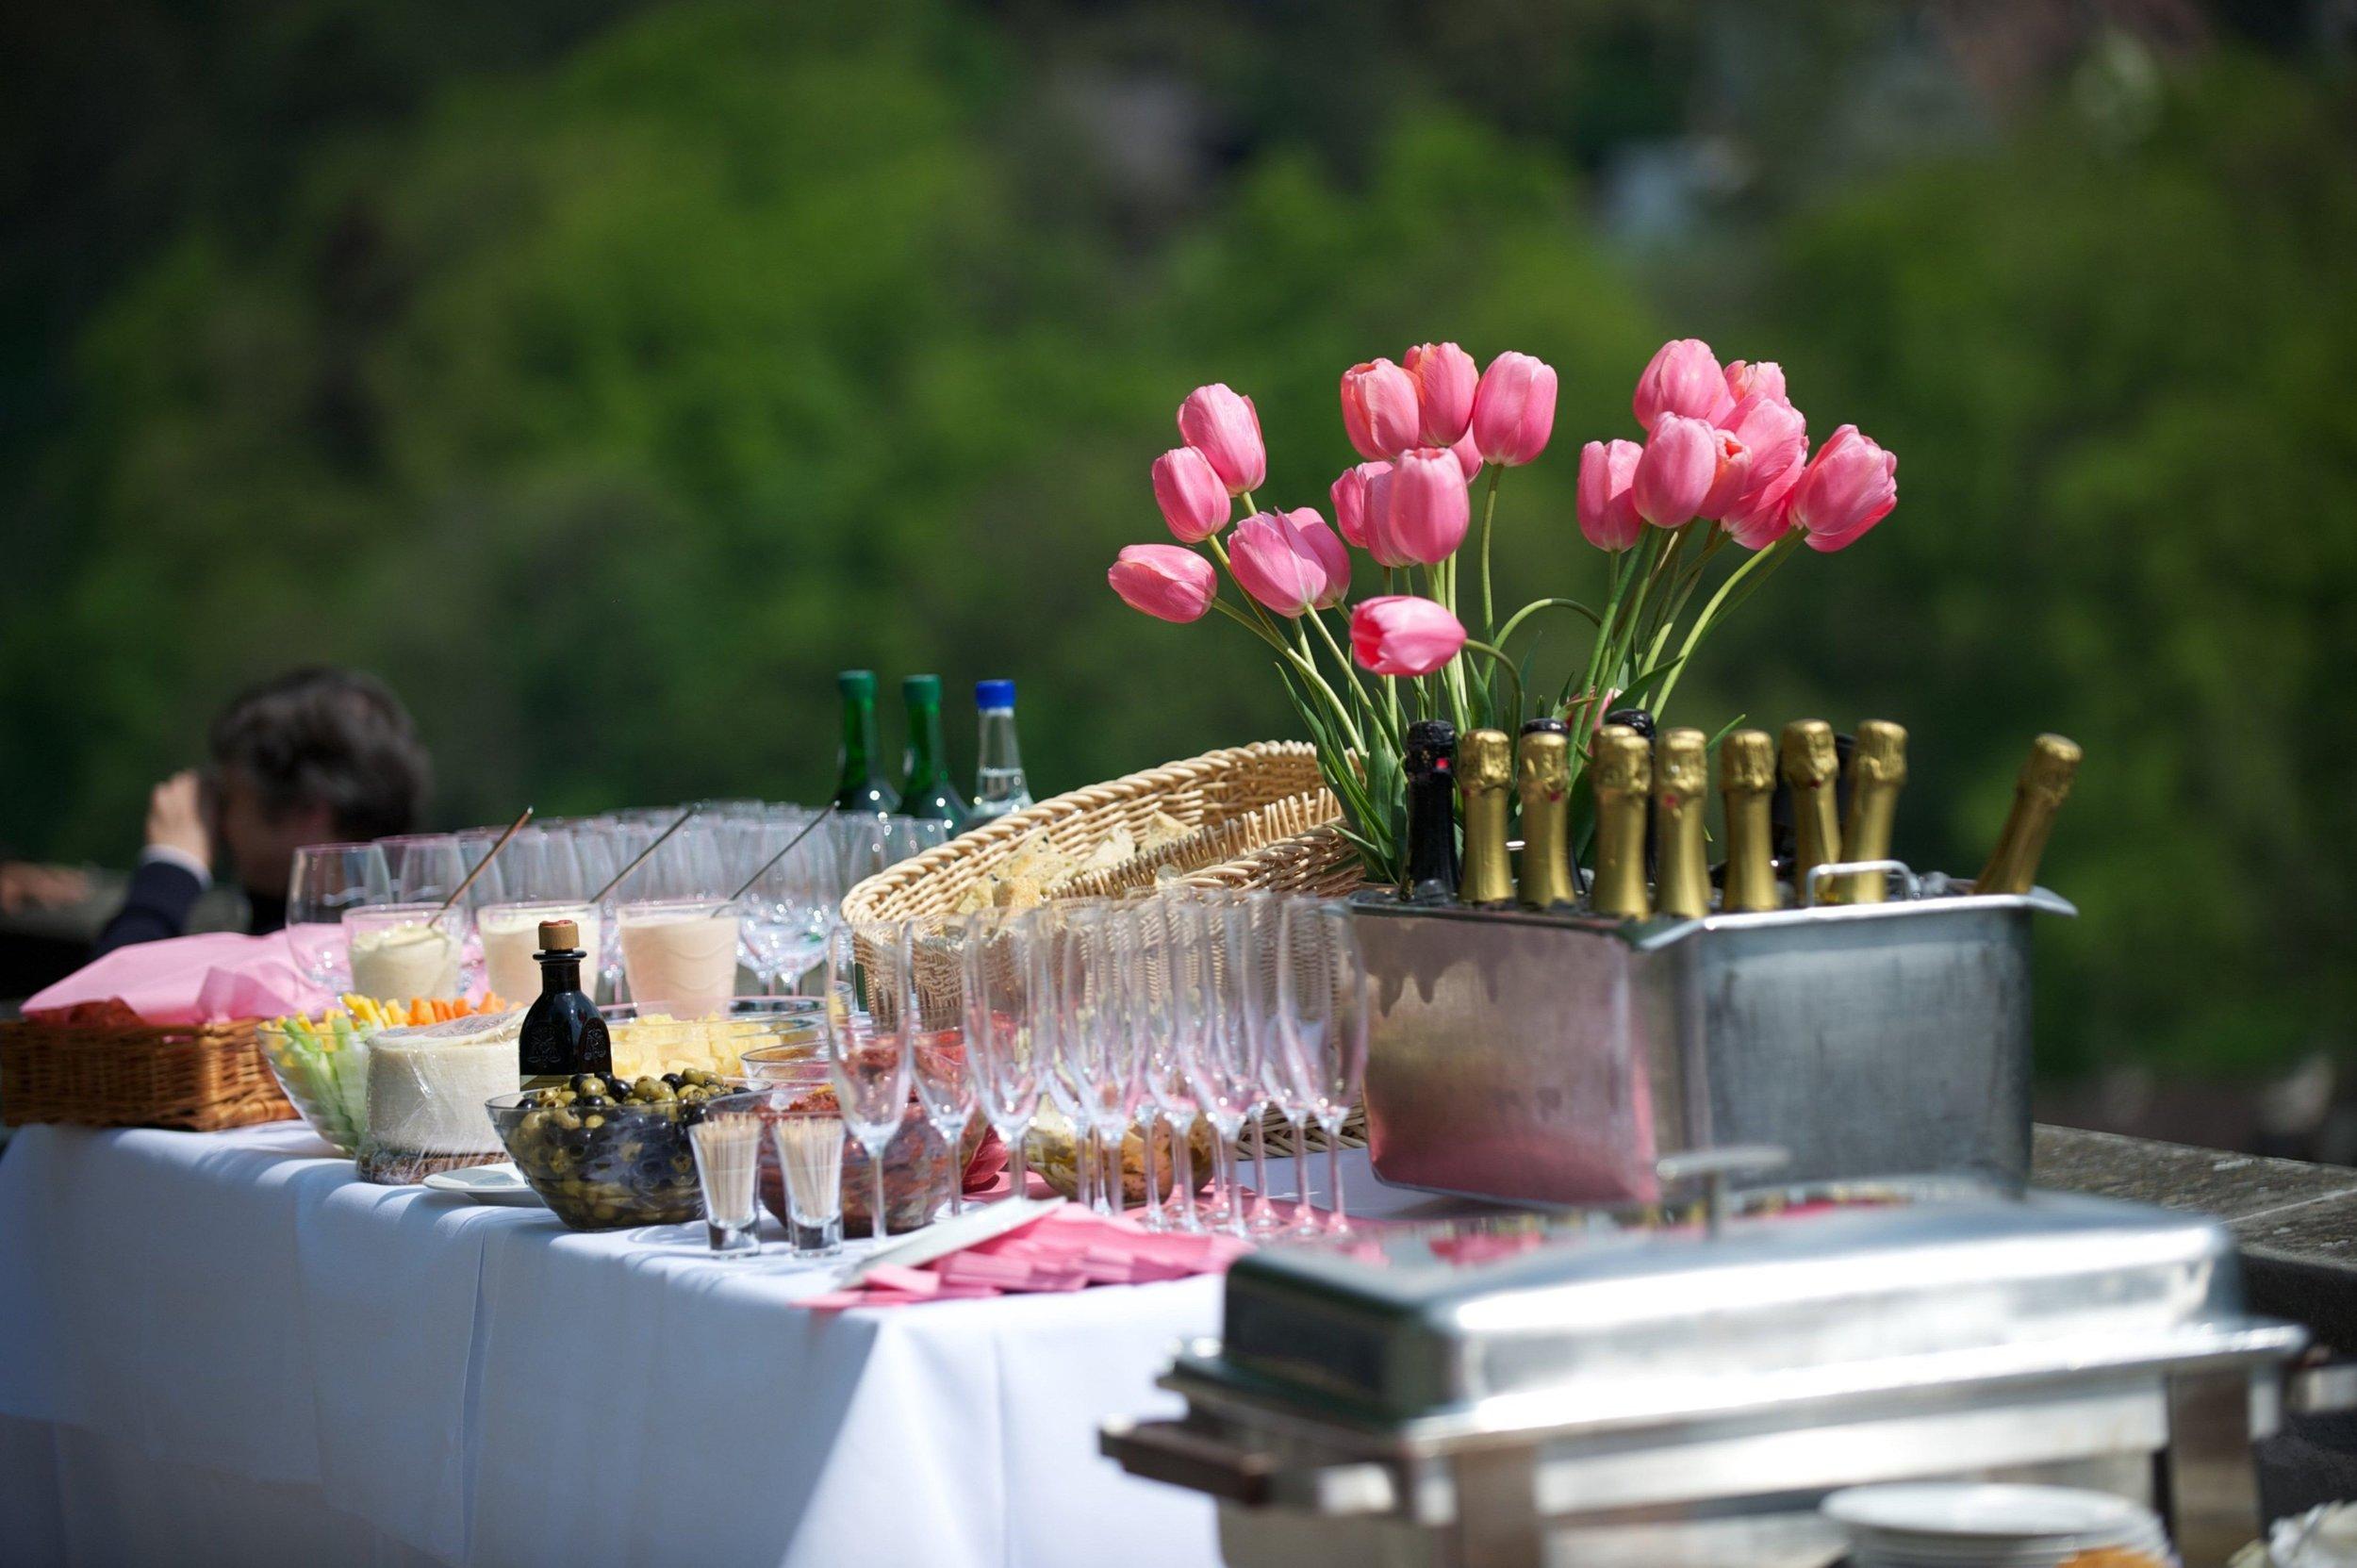 table-flower-decoration-meal-food-flora-1017225-pxhere.com.jpg